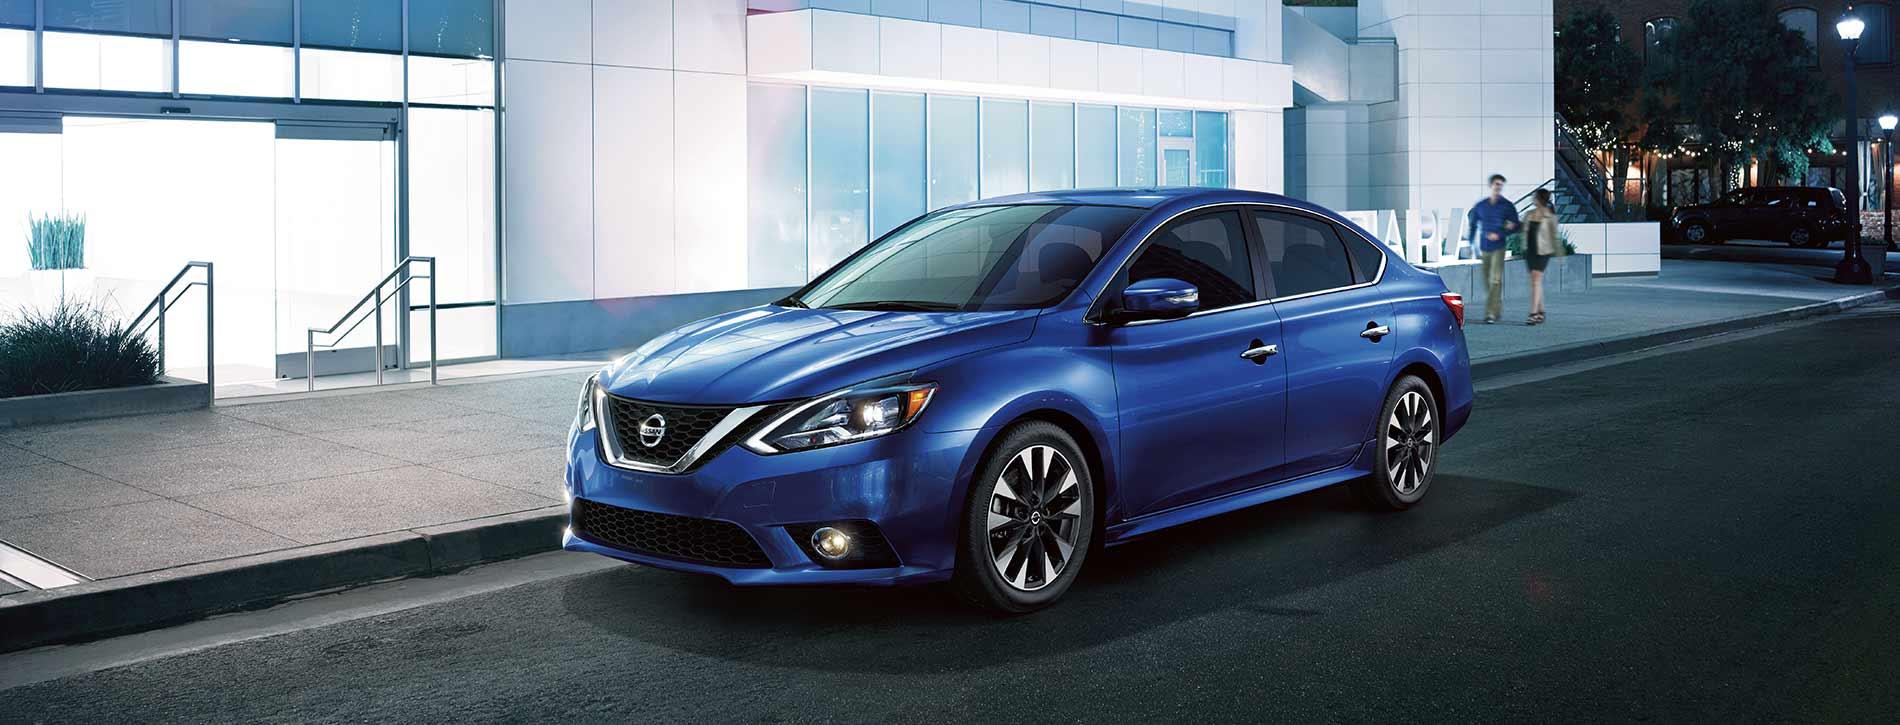 Used Cars St Joseph Mo >> Rolling Hills Nissan | St. Joseph MO. | New Nissan Dealer